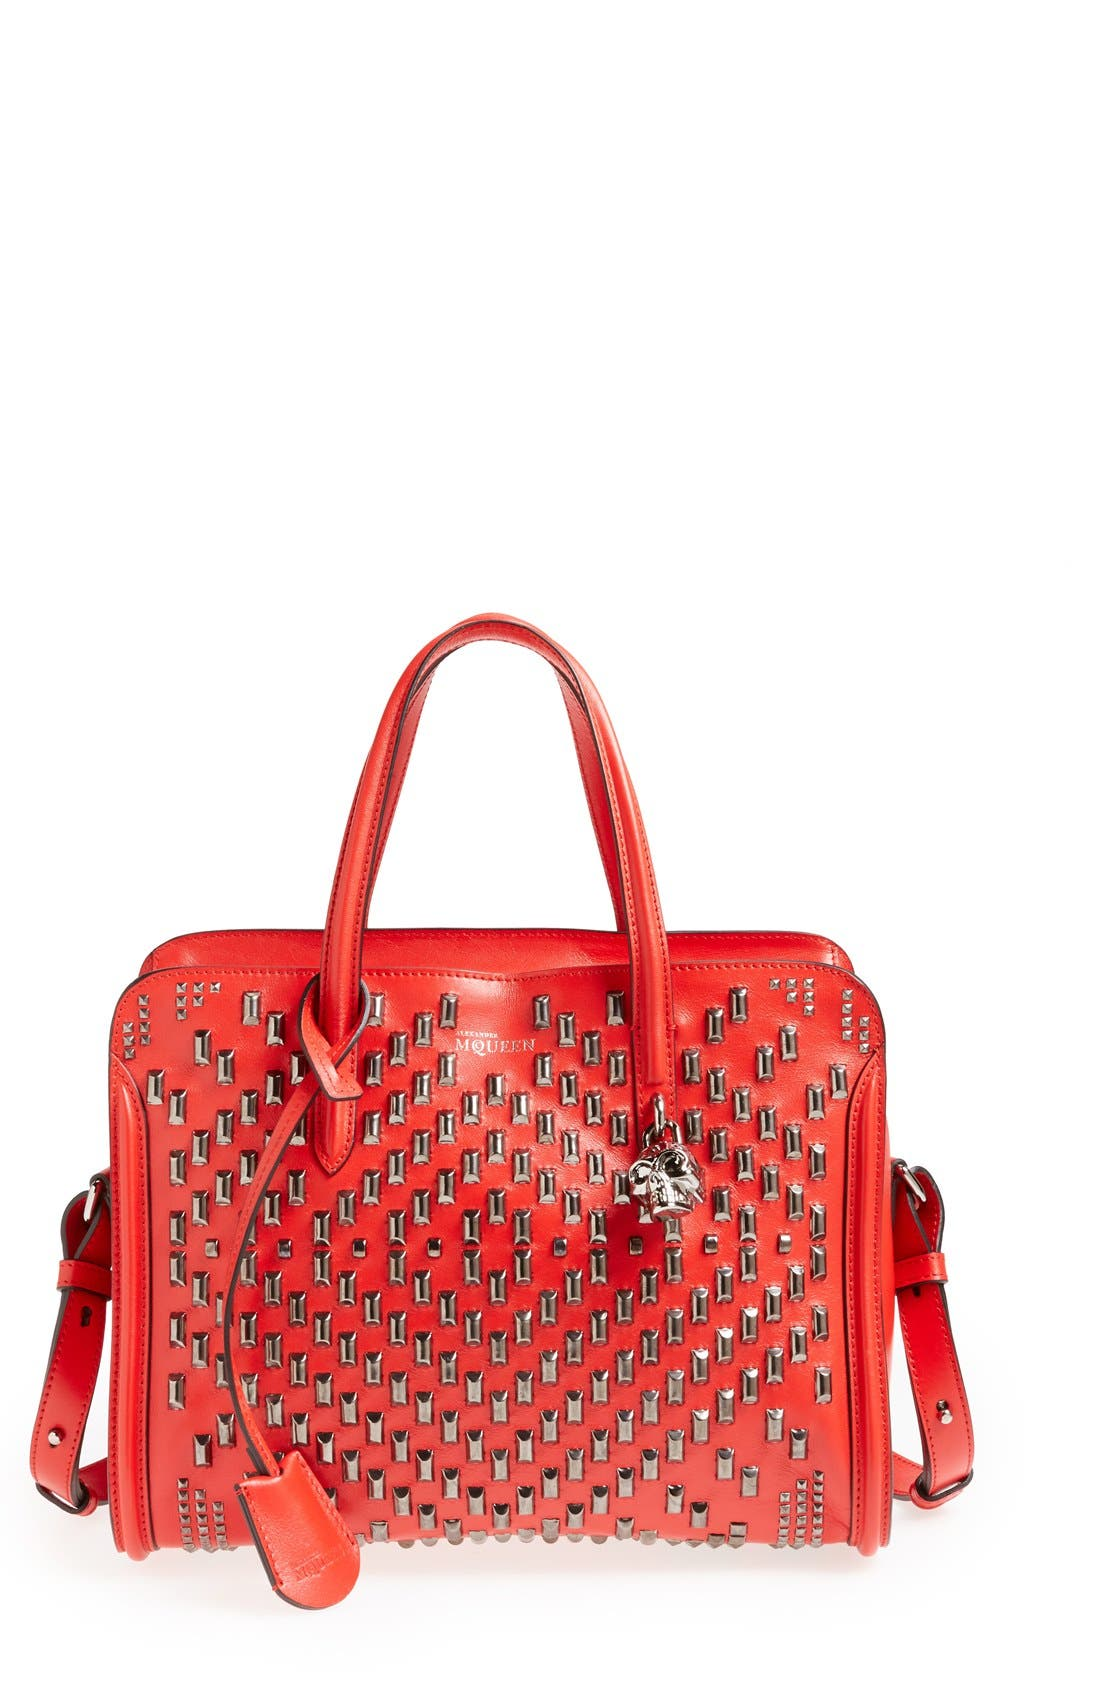 Alternate Image 1 Selected - Alexander McQueen 'Small Padlock' Studded Duffel Bag